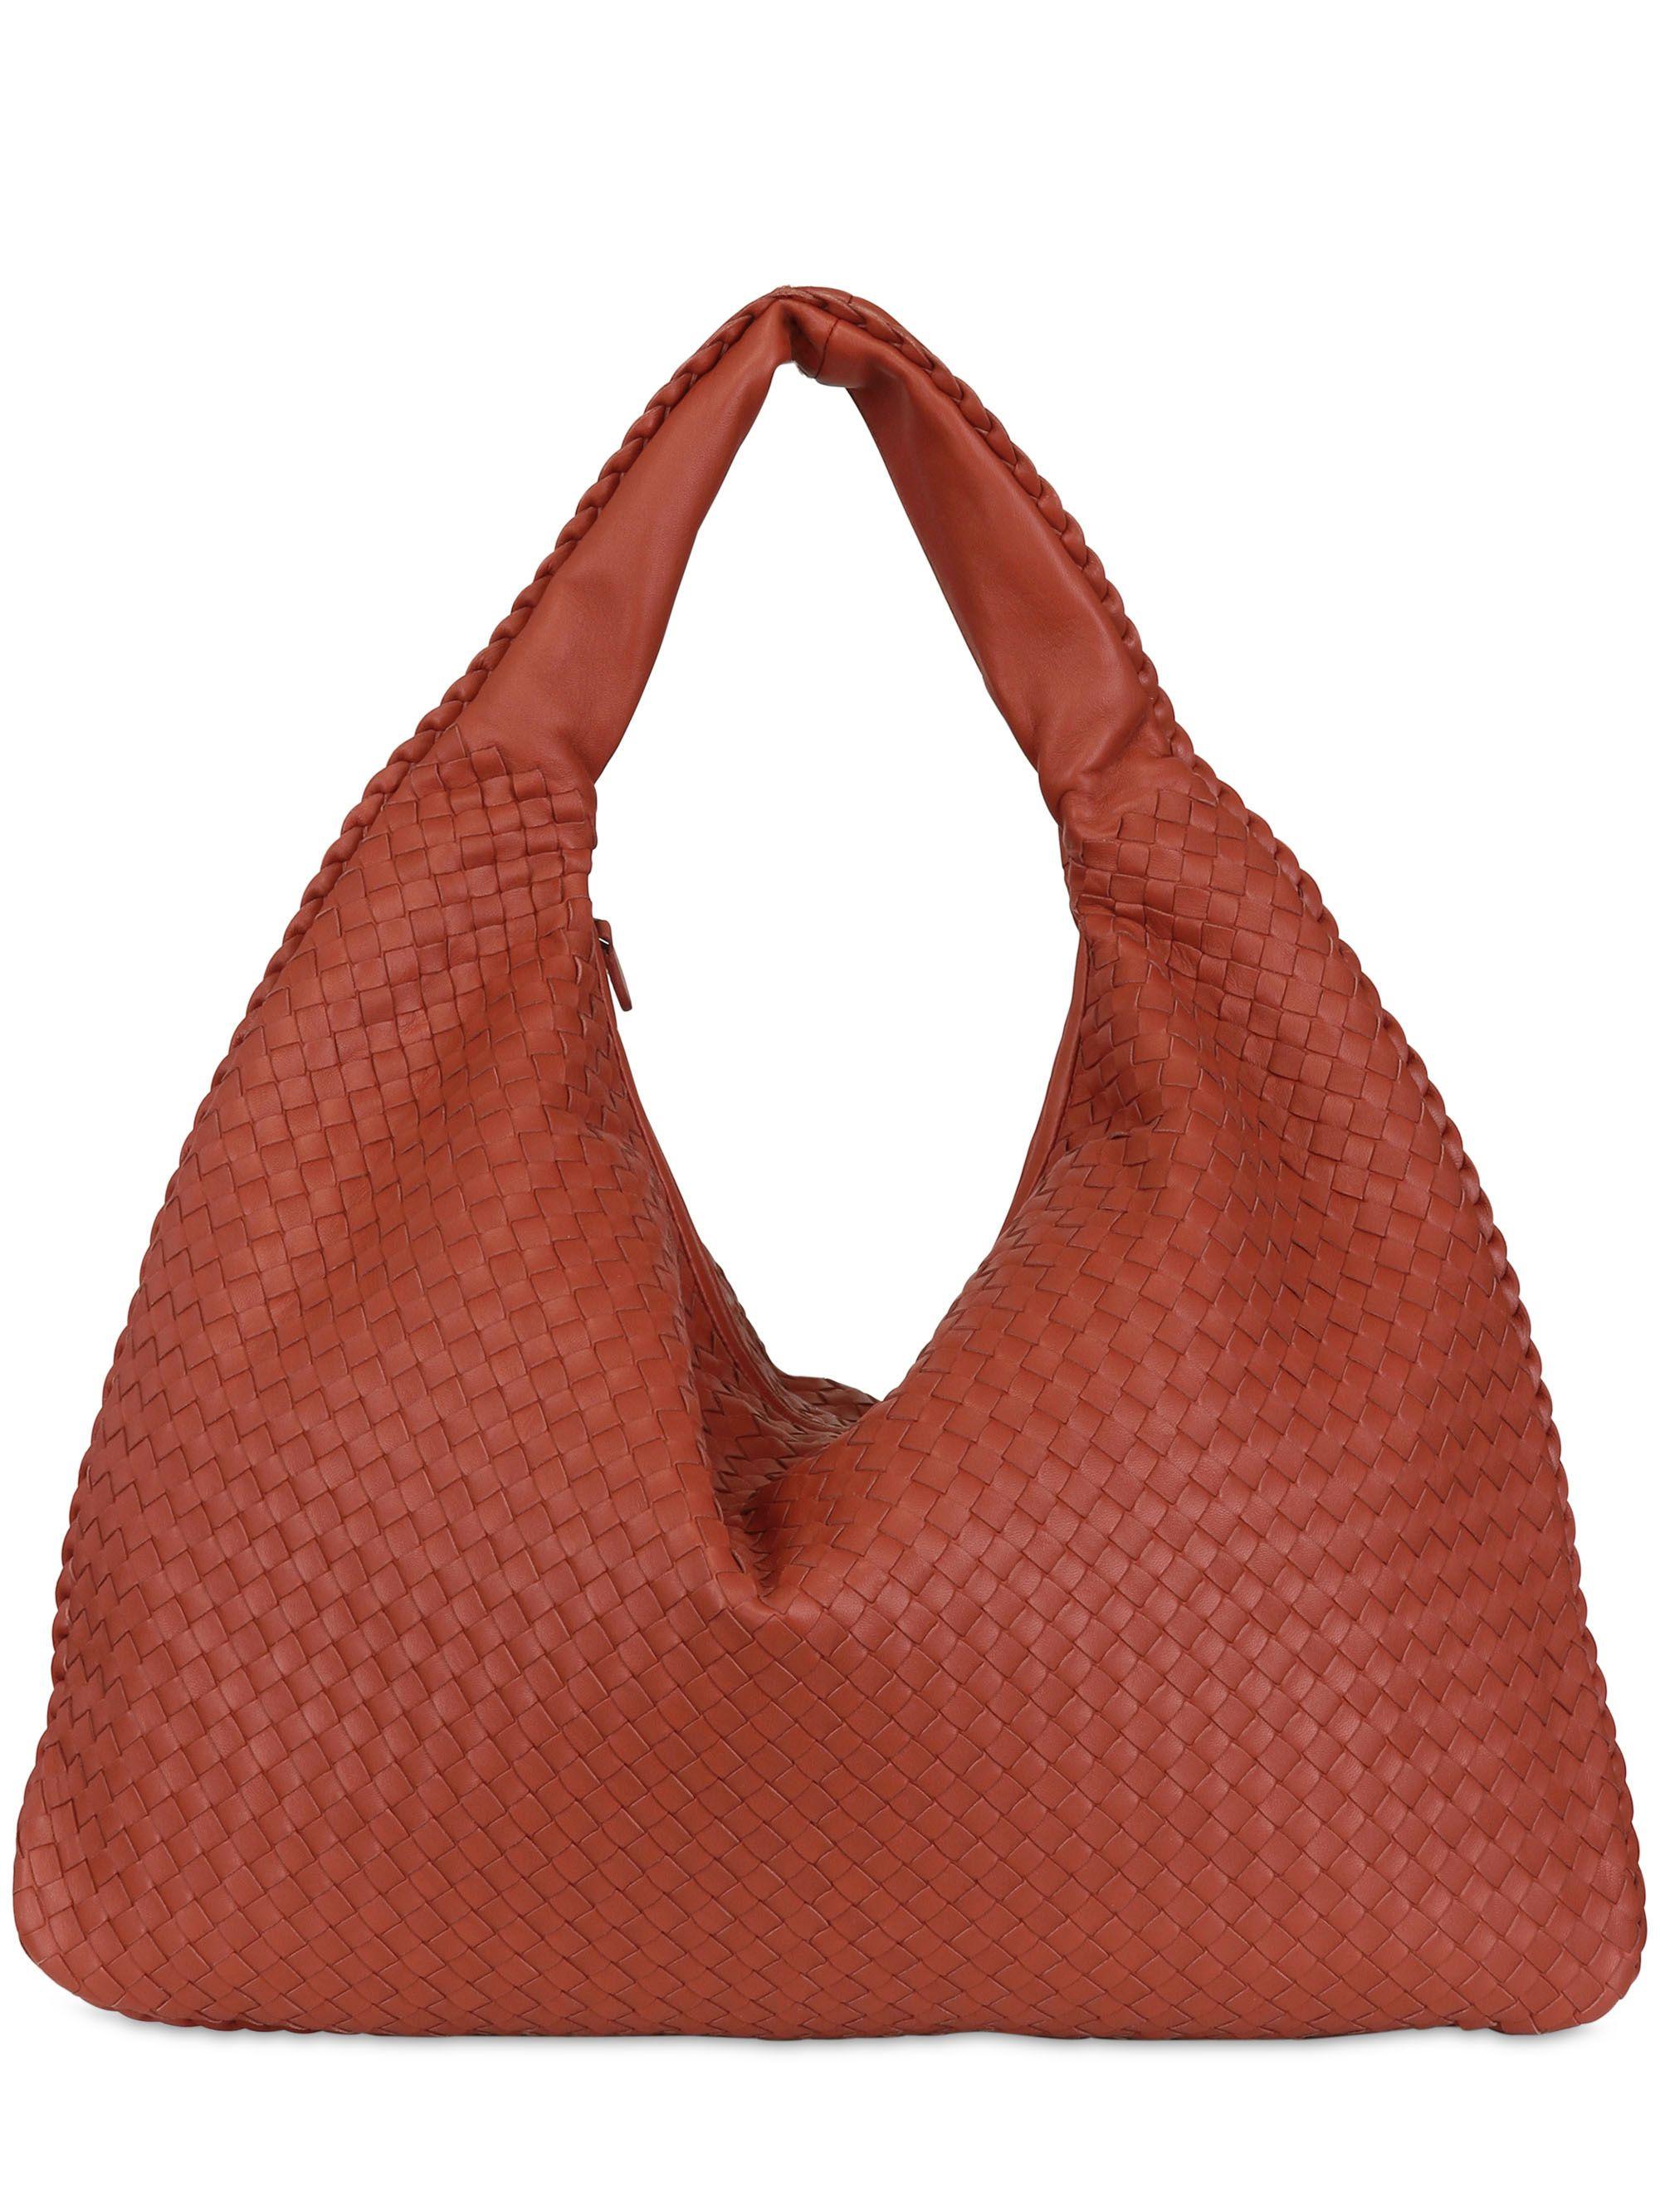 94384ae9da Lyst - Bottega Veneta Maxi Veneta Intreccio Nappa Leather Bag in Brown